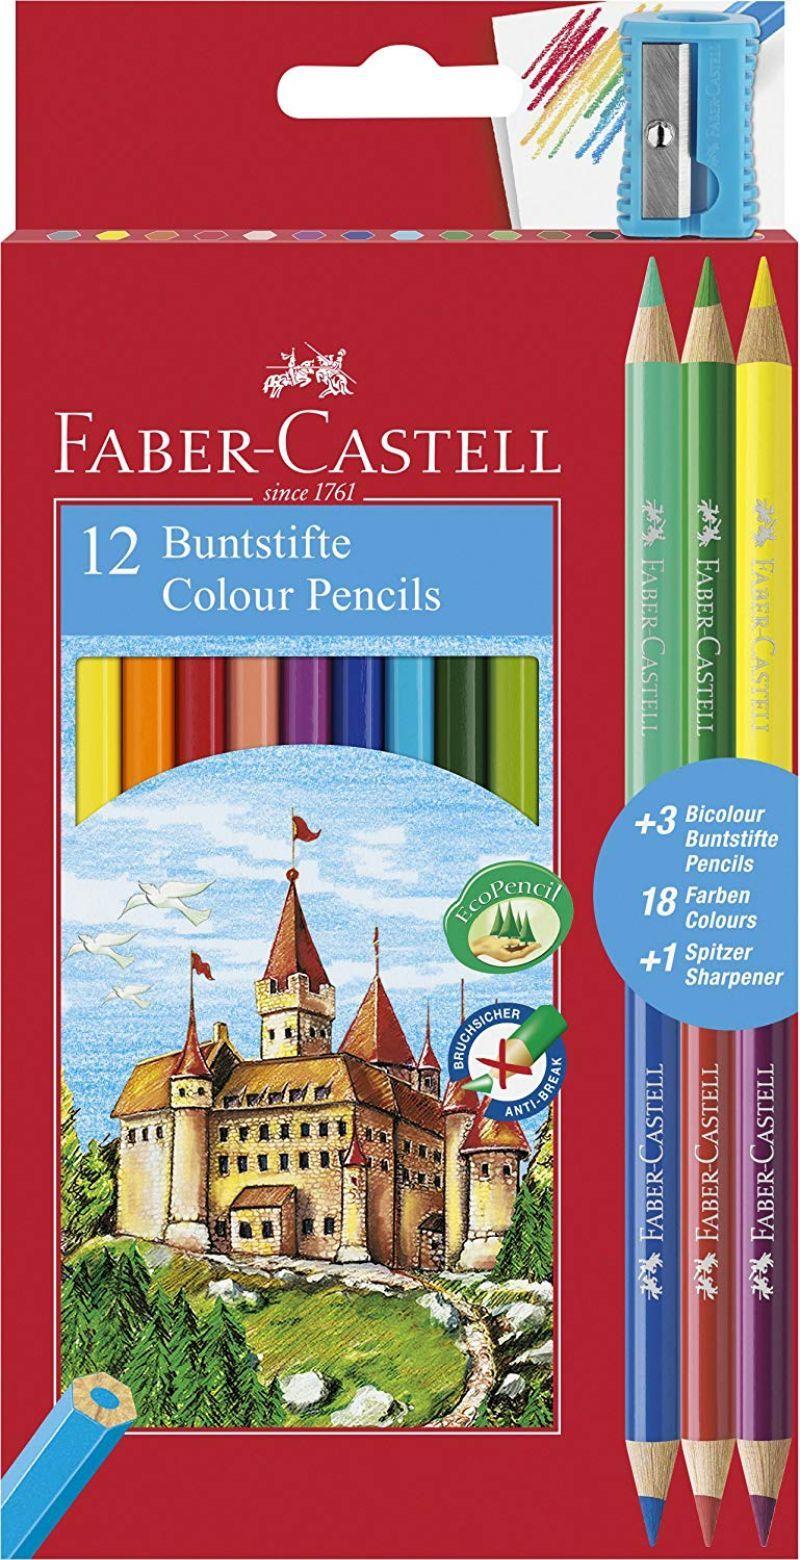 12-ecomatite-faber-castell-appuntino